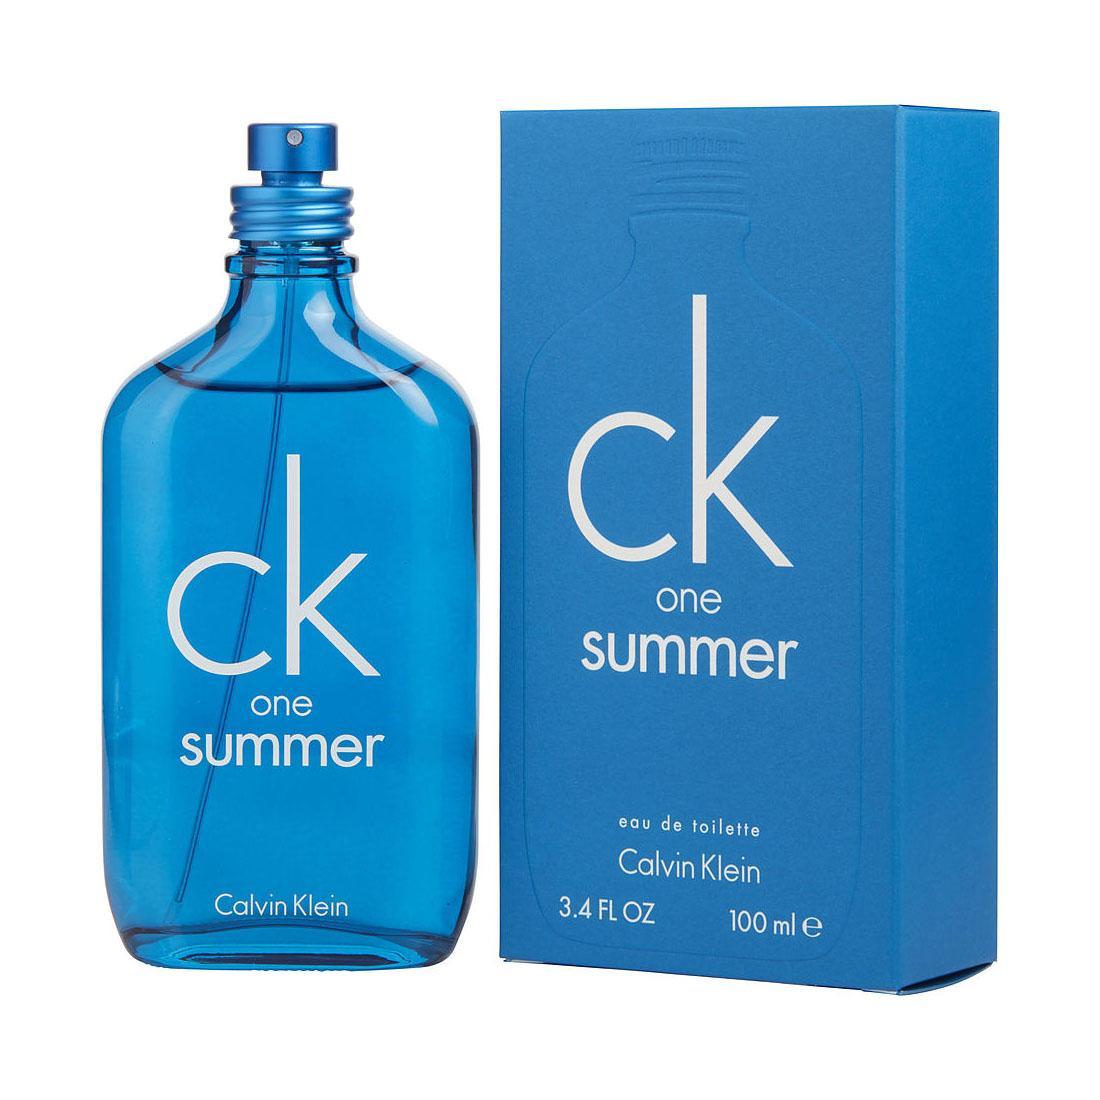 Nước Hoa Unisex Calvin Klein One Summer Limited Edition 2018 EDT 100ml